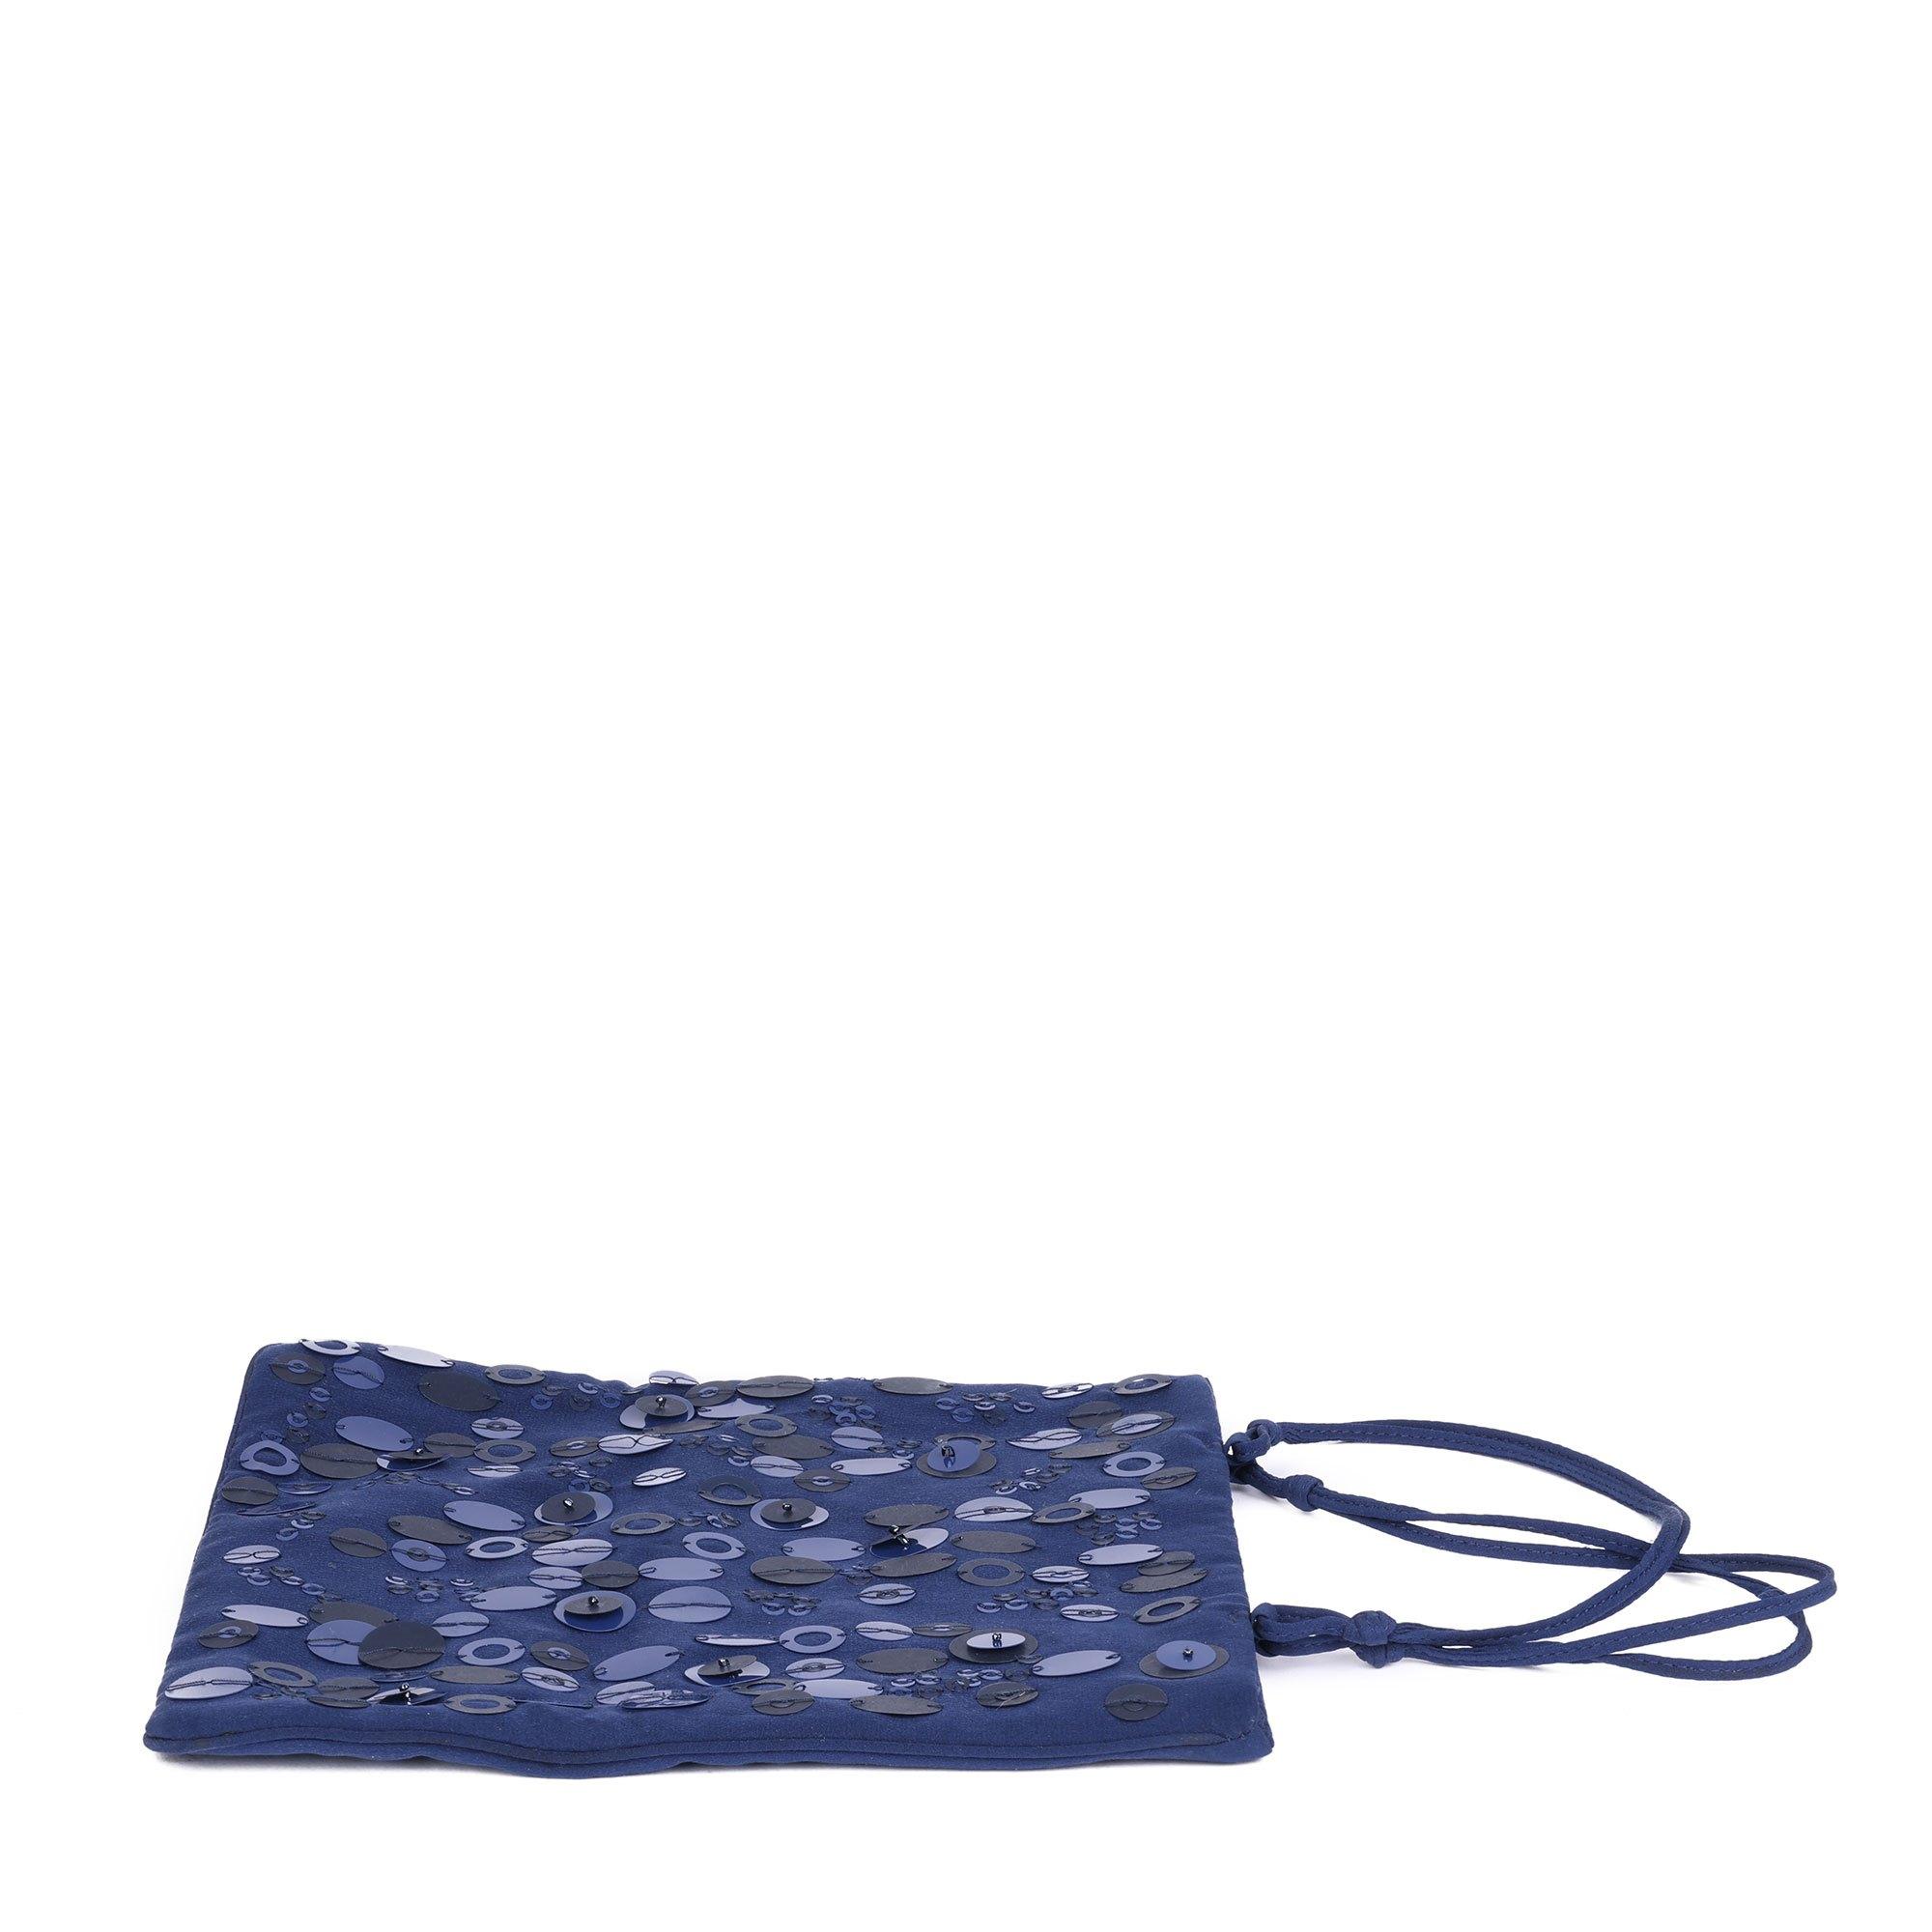 Prada Navy Embellished Fabric Vintage Evening Tote